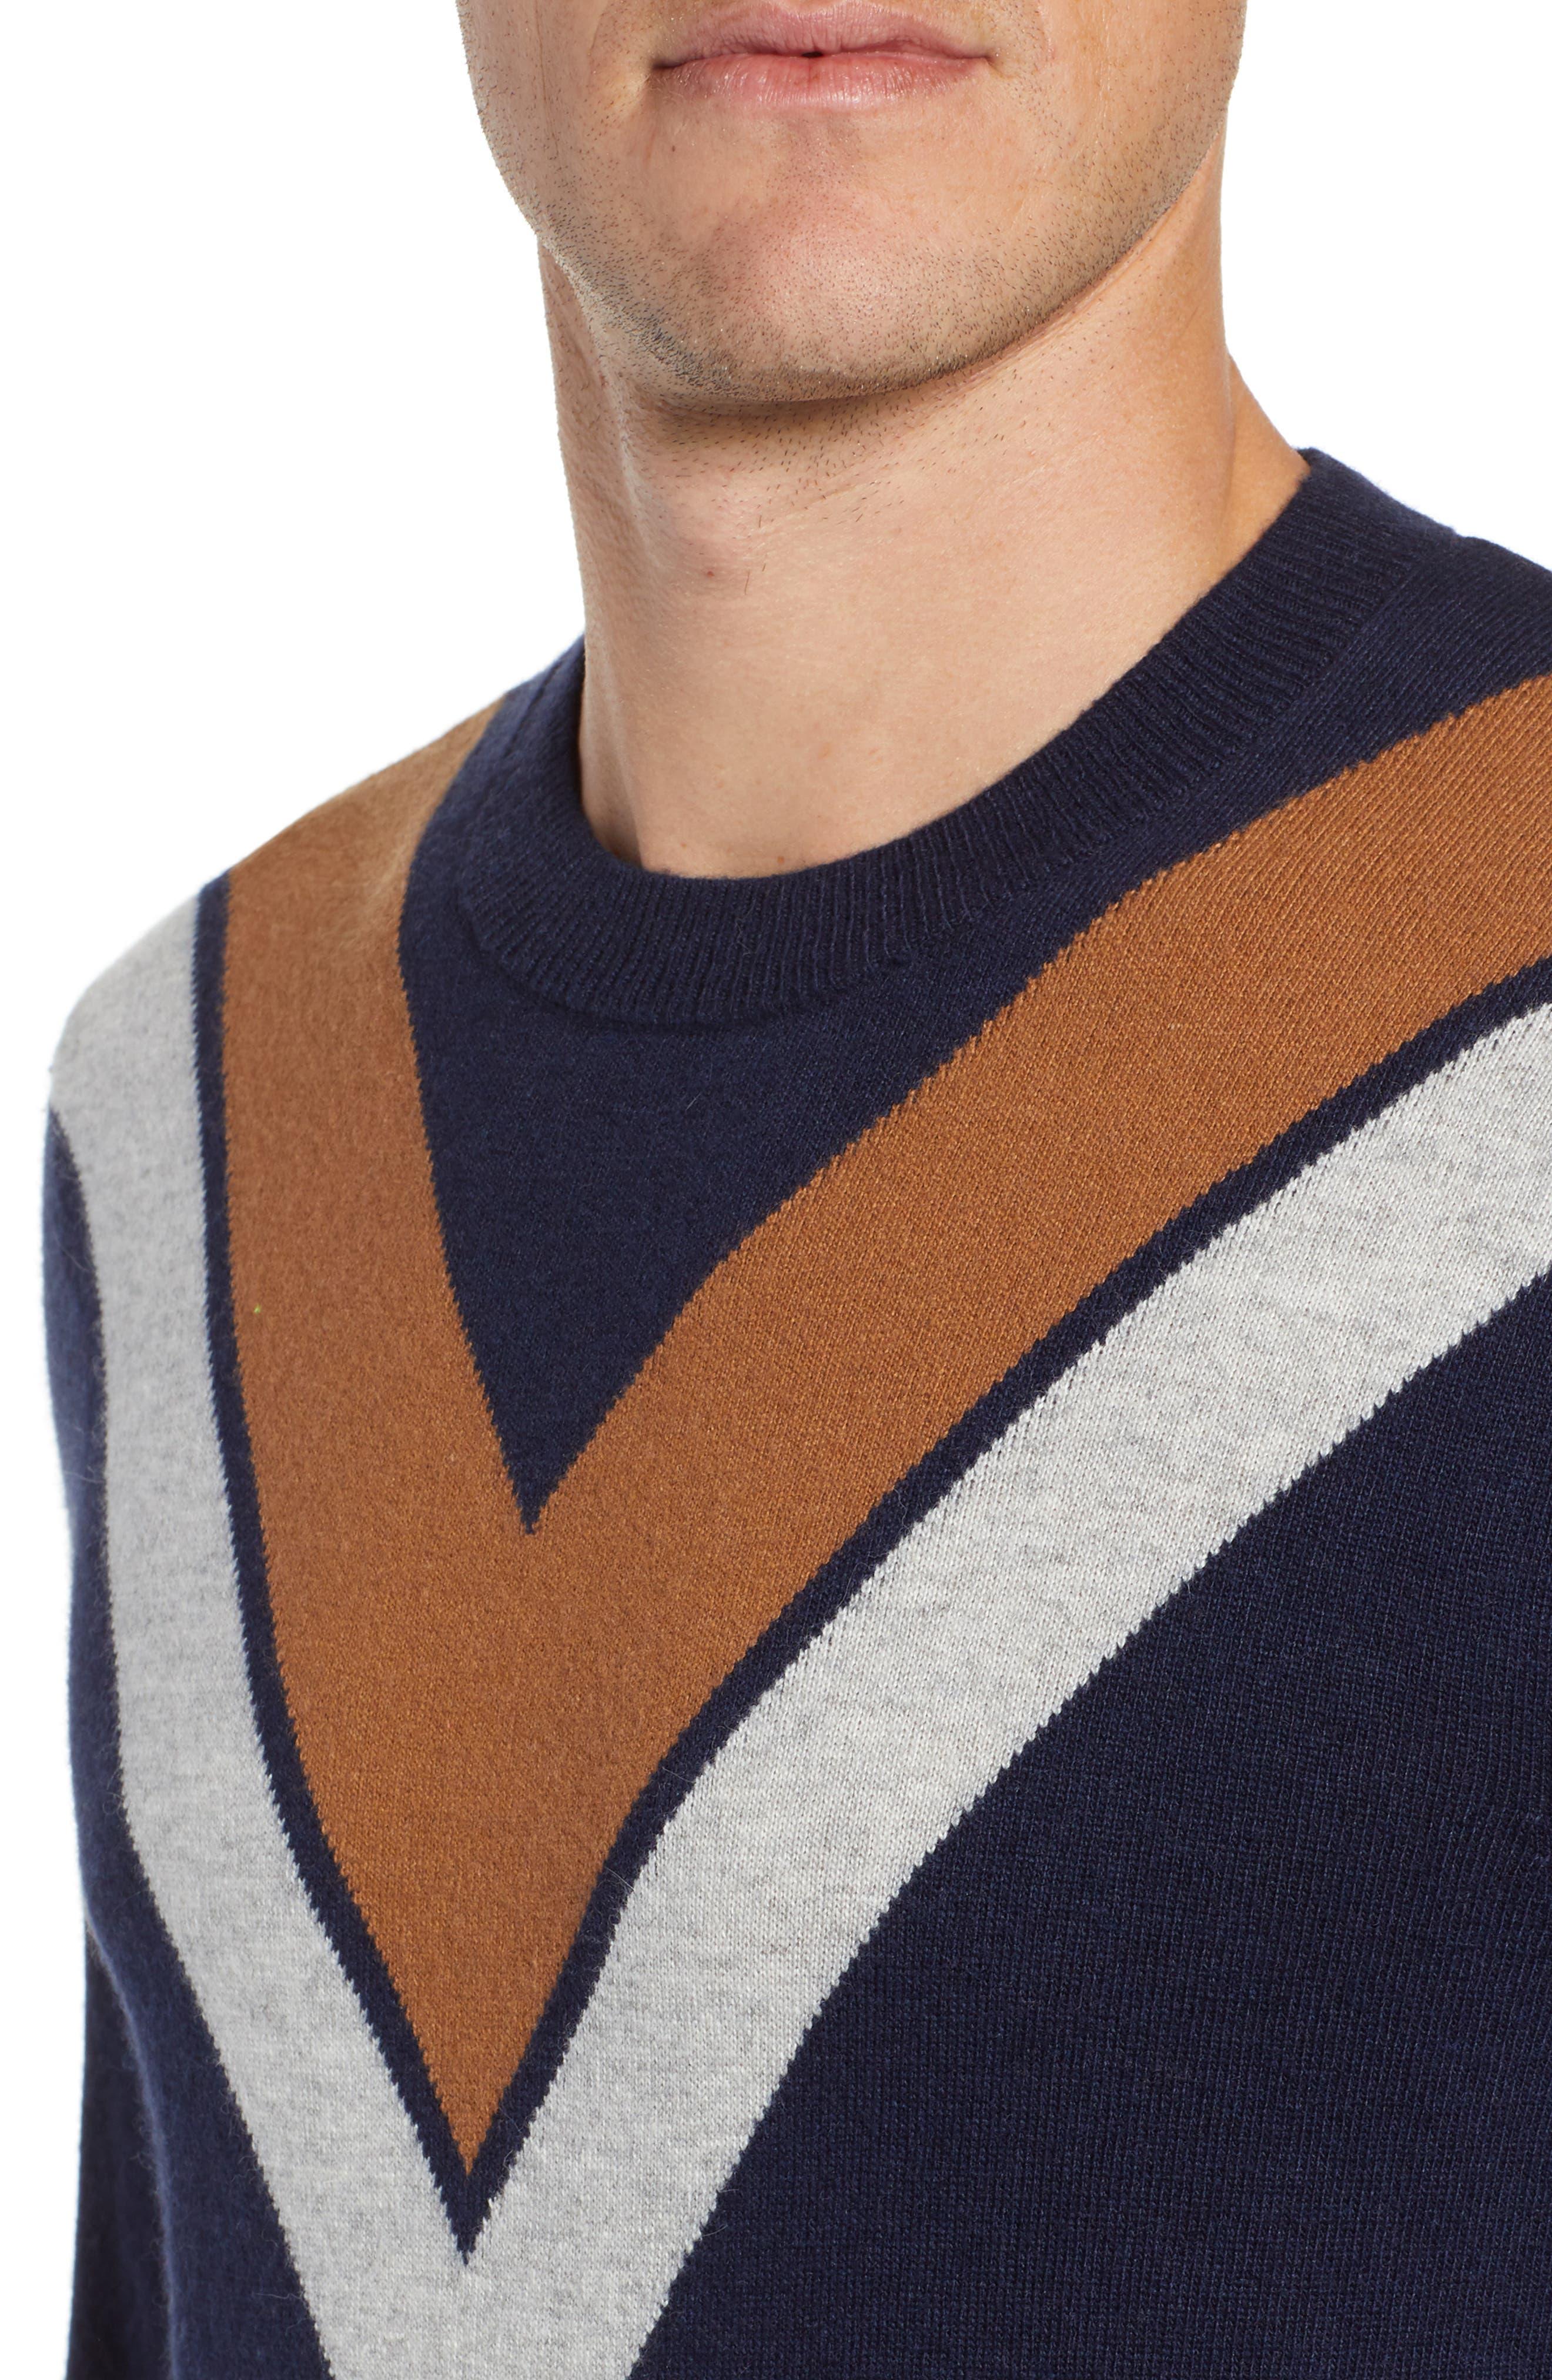 Minton V Crewneck Sweater,                             Alternate thumbnail 4, color,                             DARK NAVY/ LHN/ BURNT SUGAR